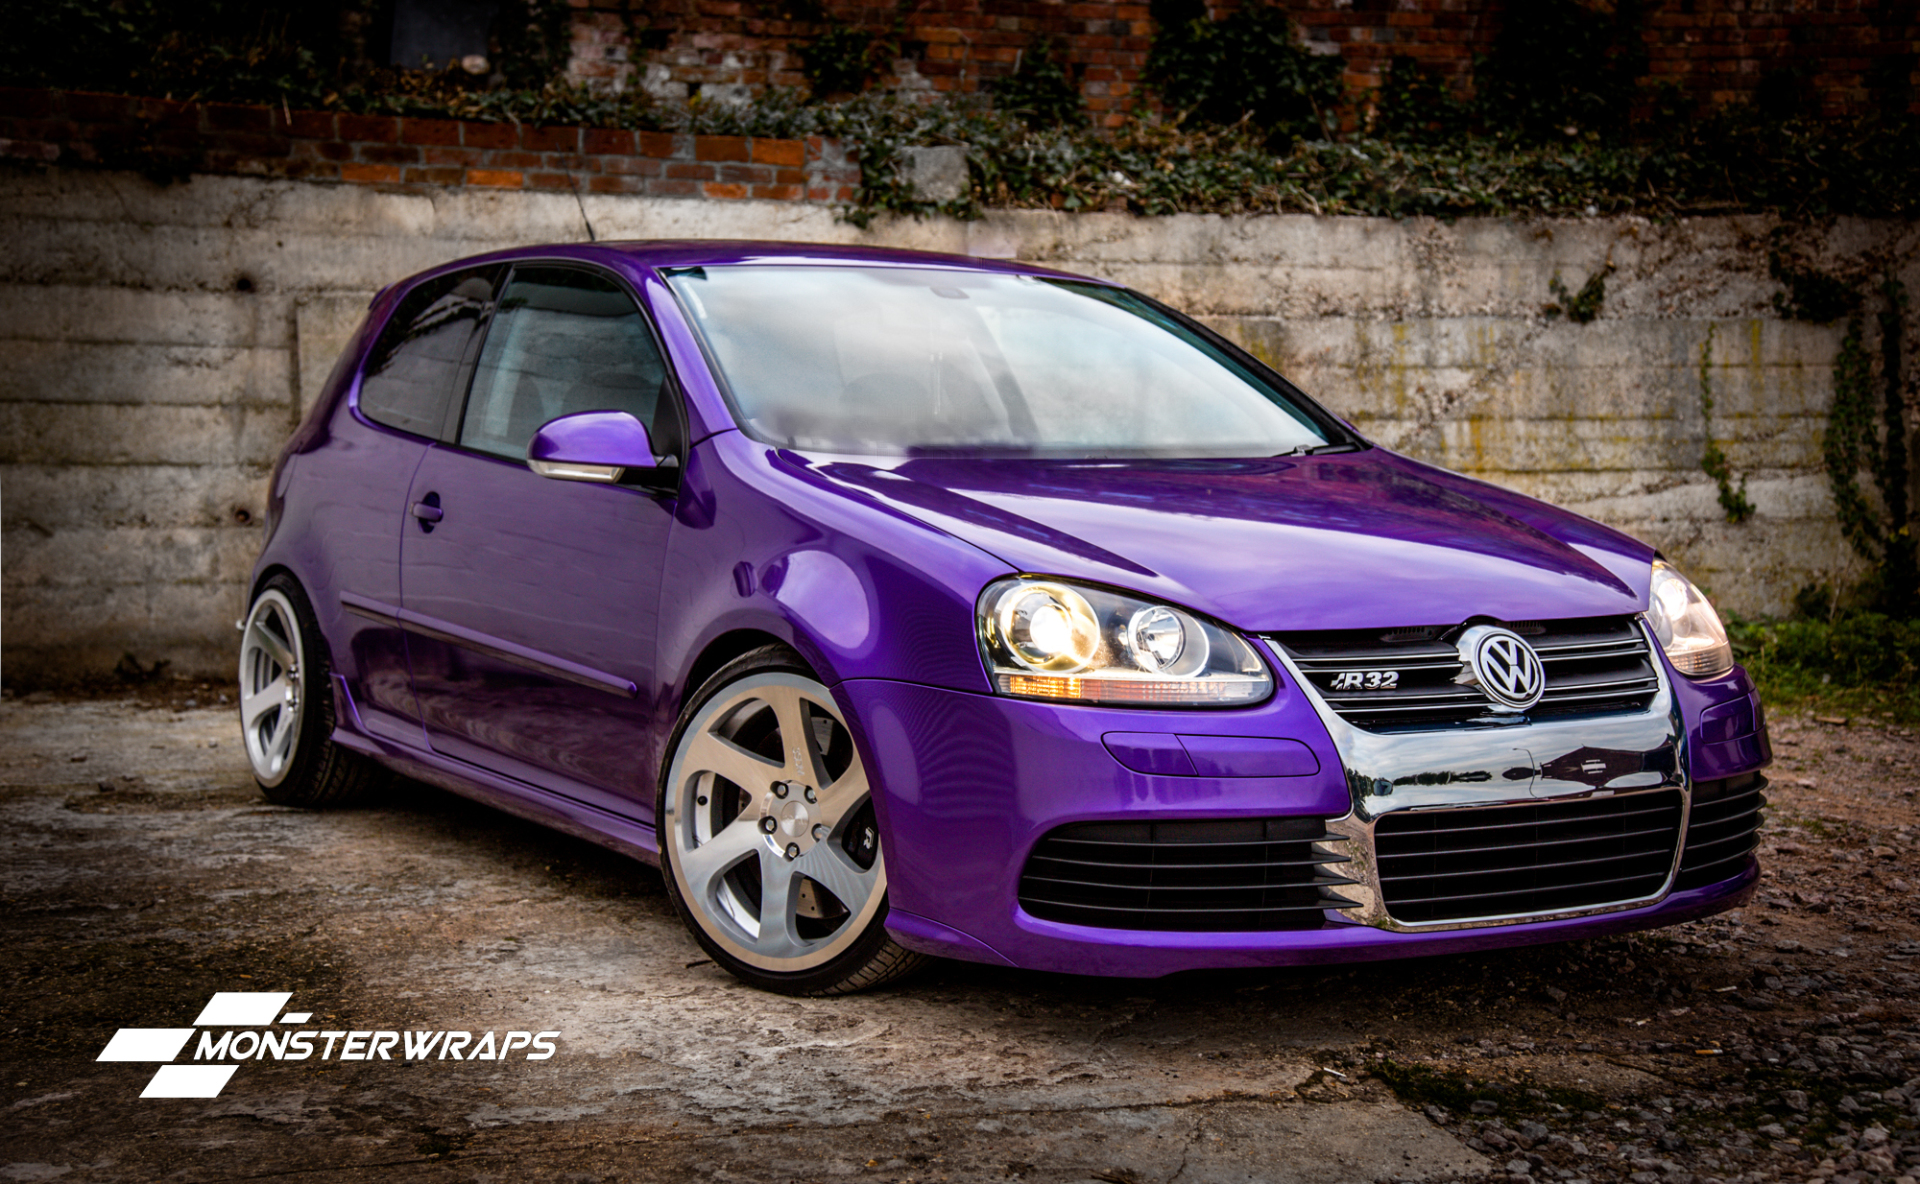 VW Golf R32 Gloss metallic purple full wrap